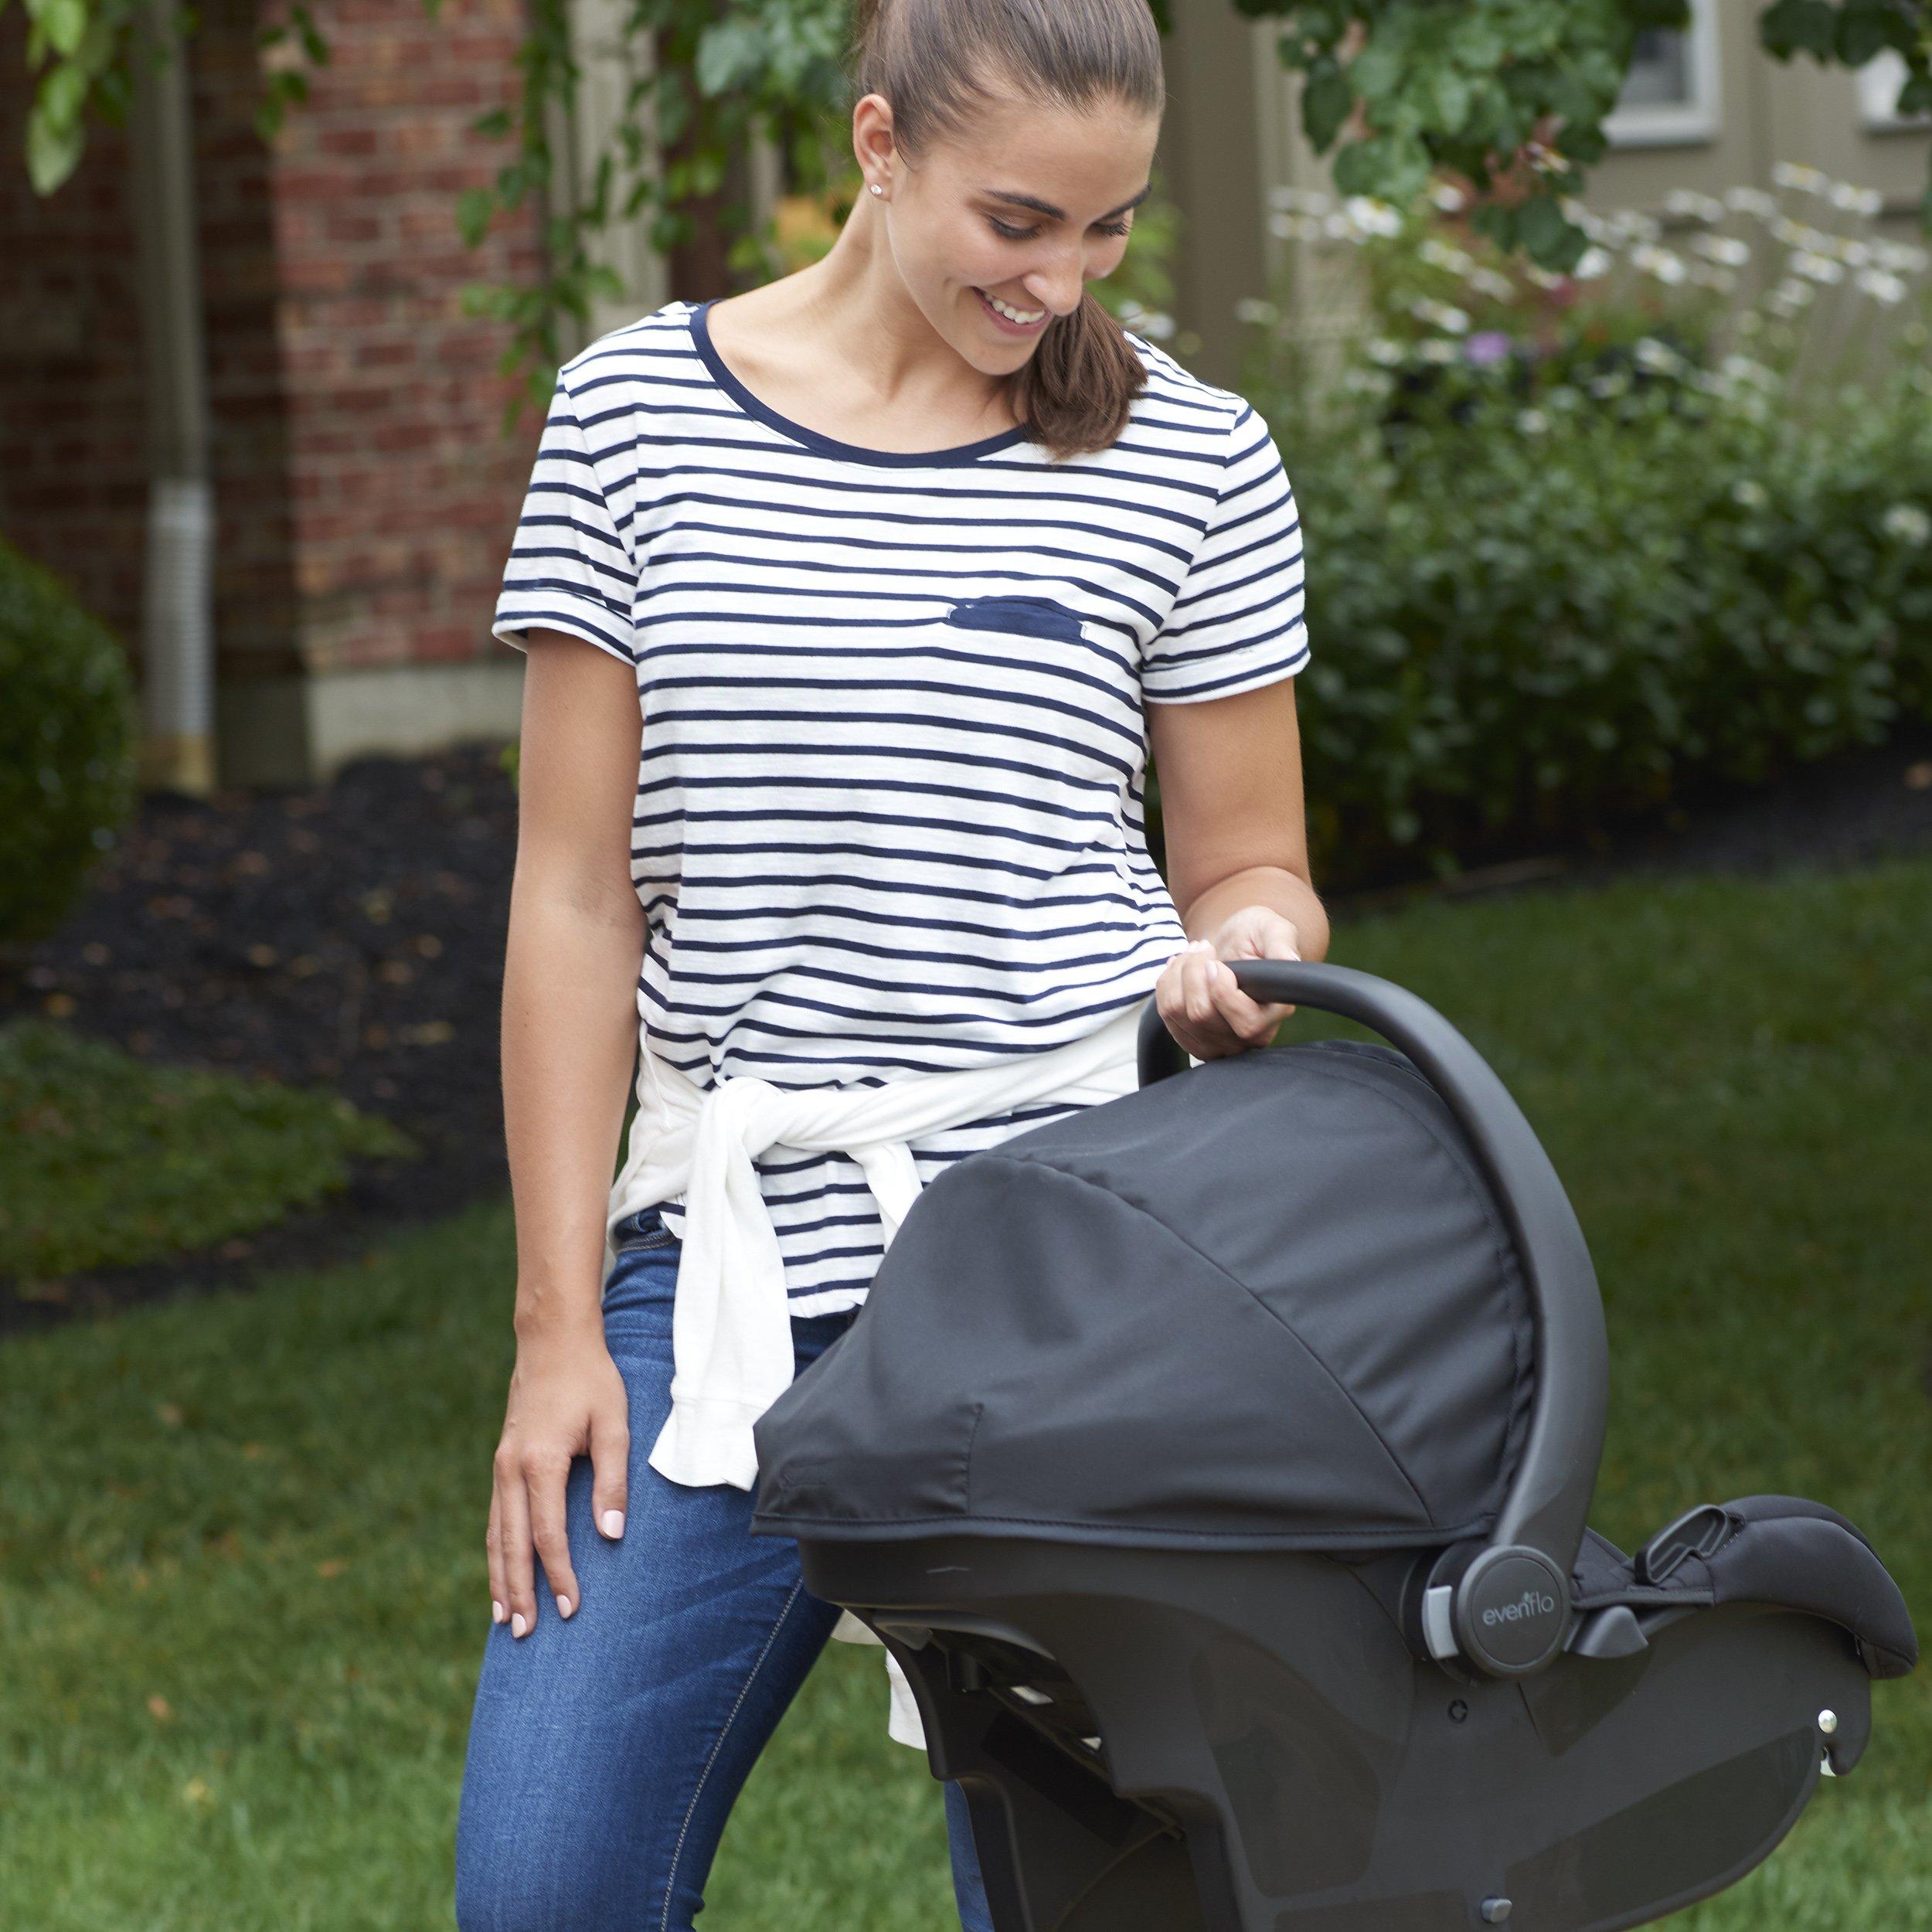 Evenflo Advanced SensorSafe Epic Travel System with LiteMax Infant Car Seat, Jet by Evenflo (Image #5)